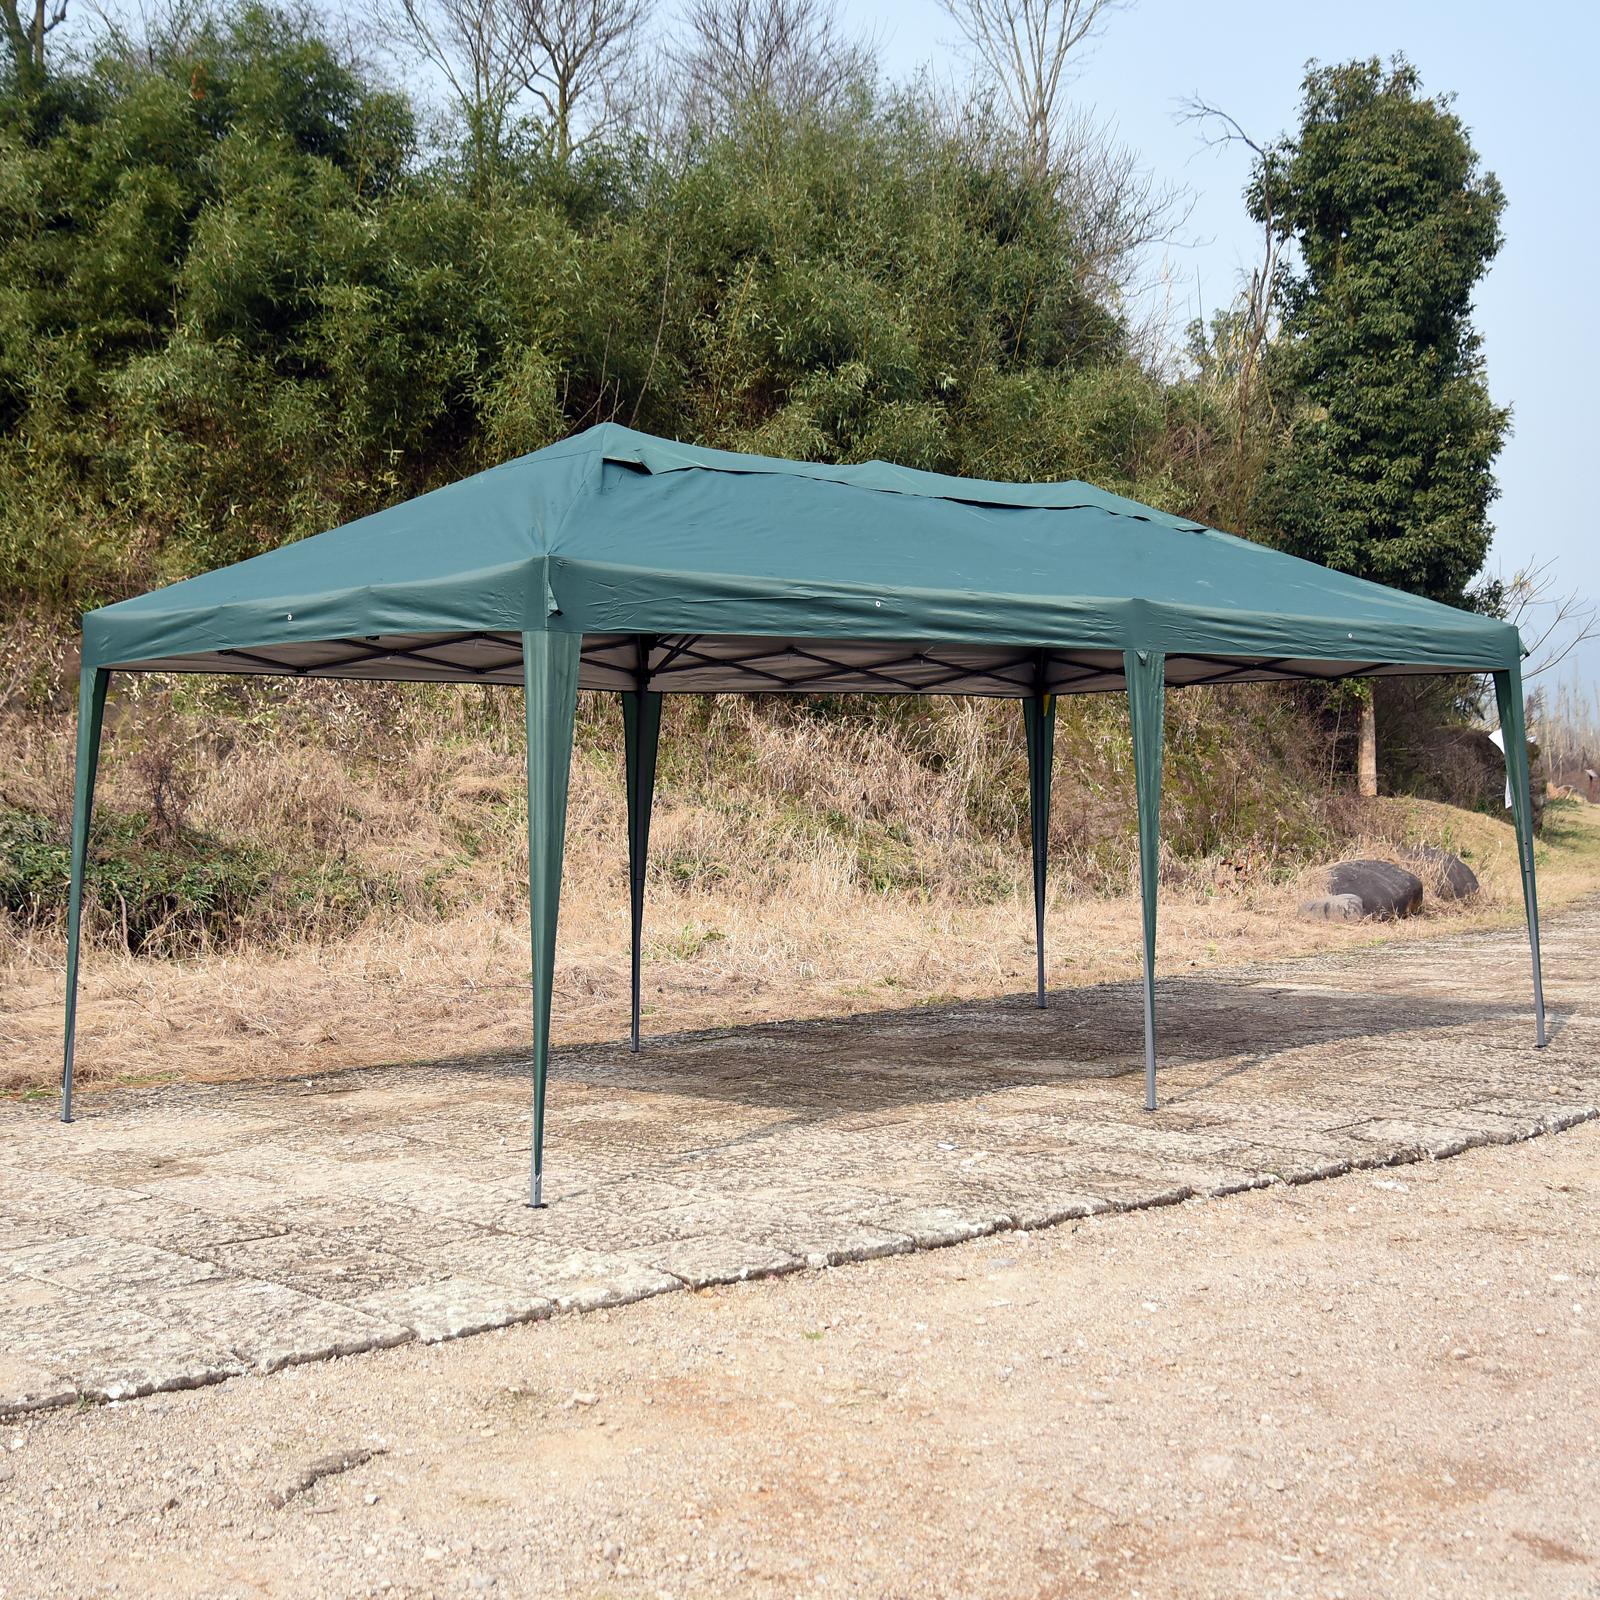 Outdoor-10-039-x20-039-EZ-POP-UP-Gazebo-Wedding-Party-Tent-Canopy-Folding-w-Carry-Bag thumbnail 25